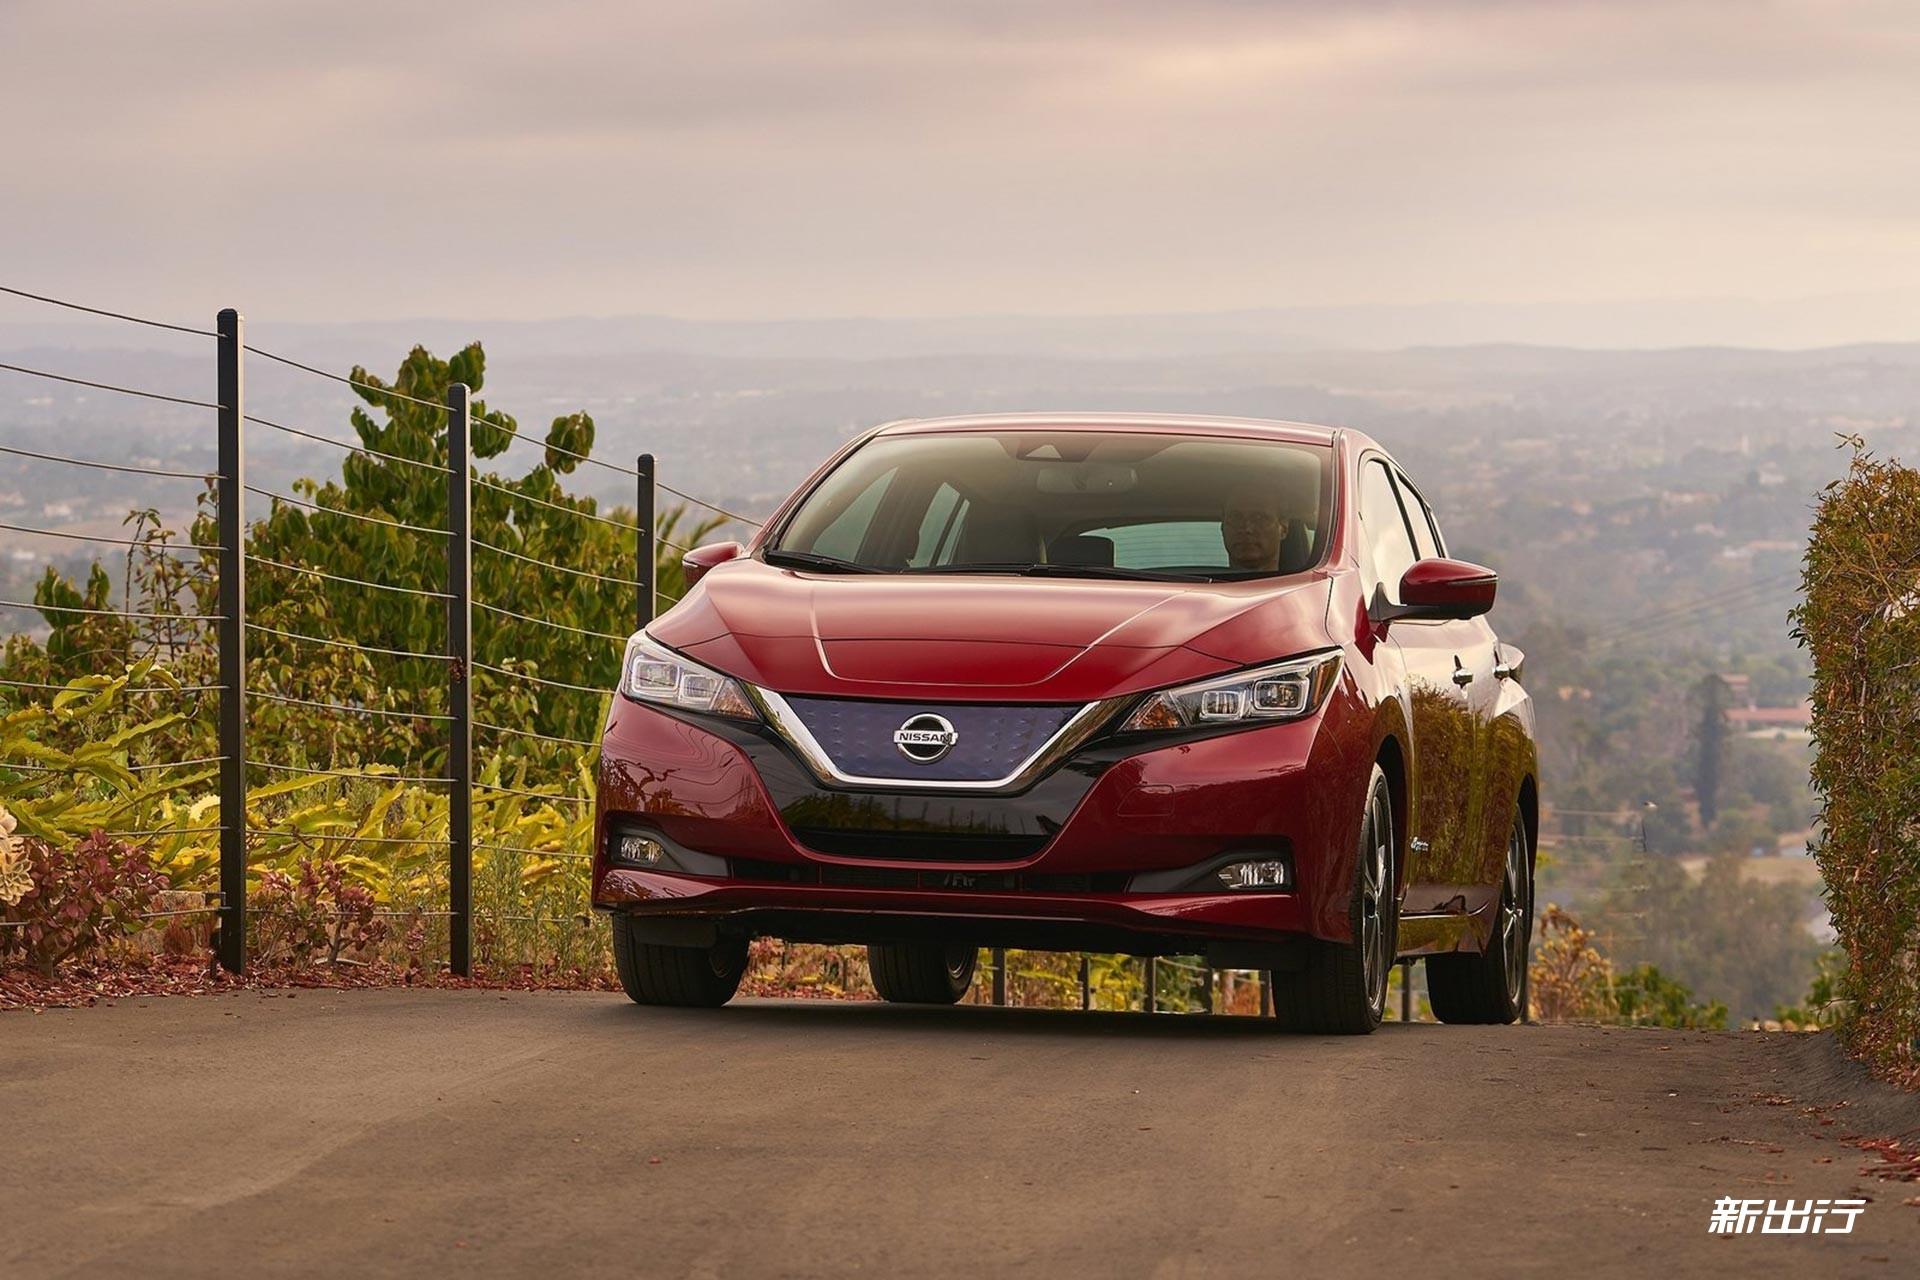 Nissan-Leaf-2018-1600-07.jpg